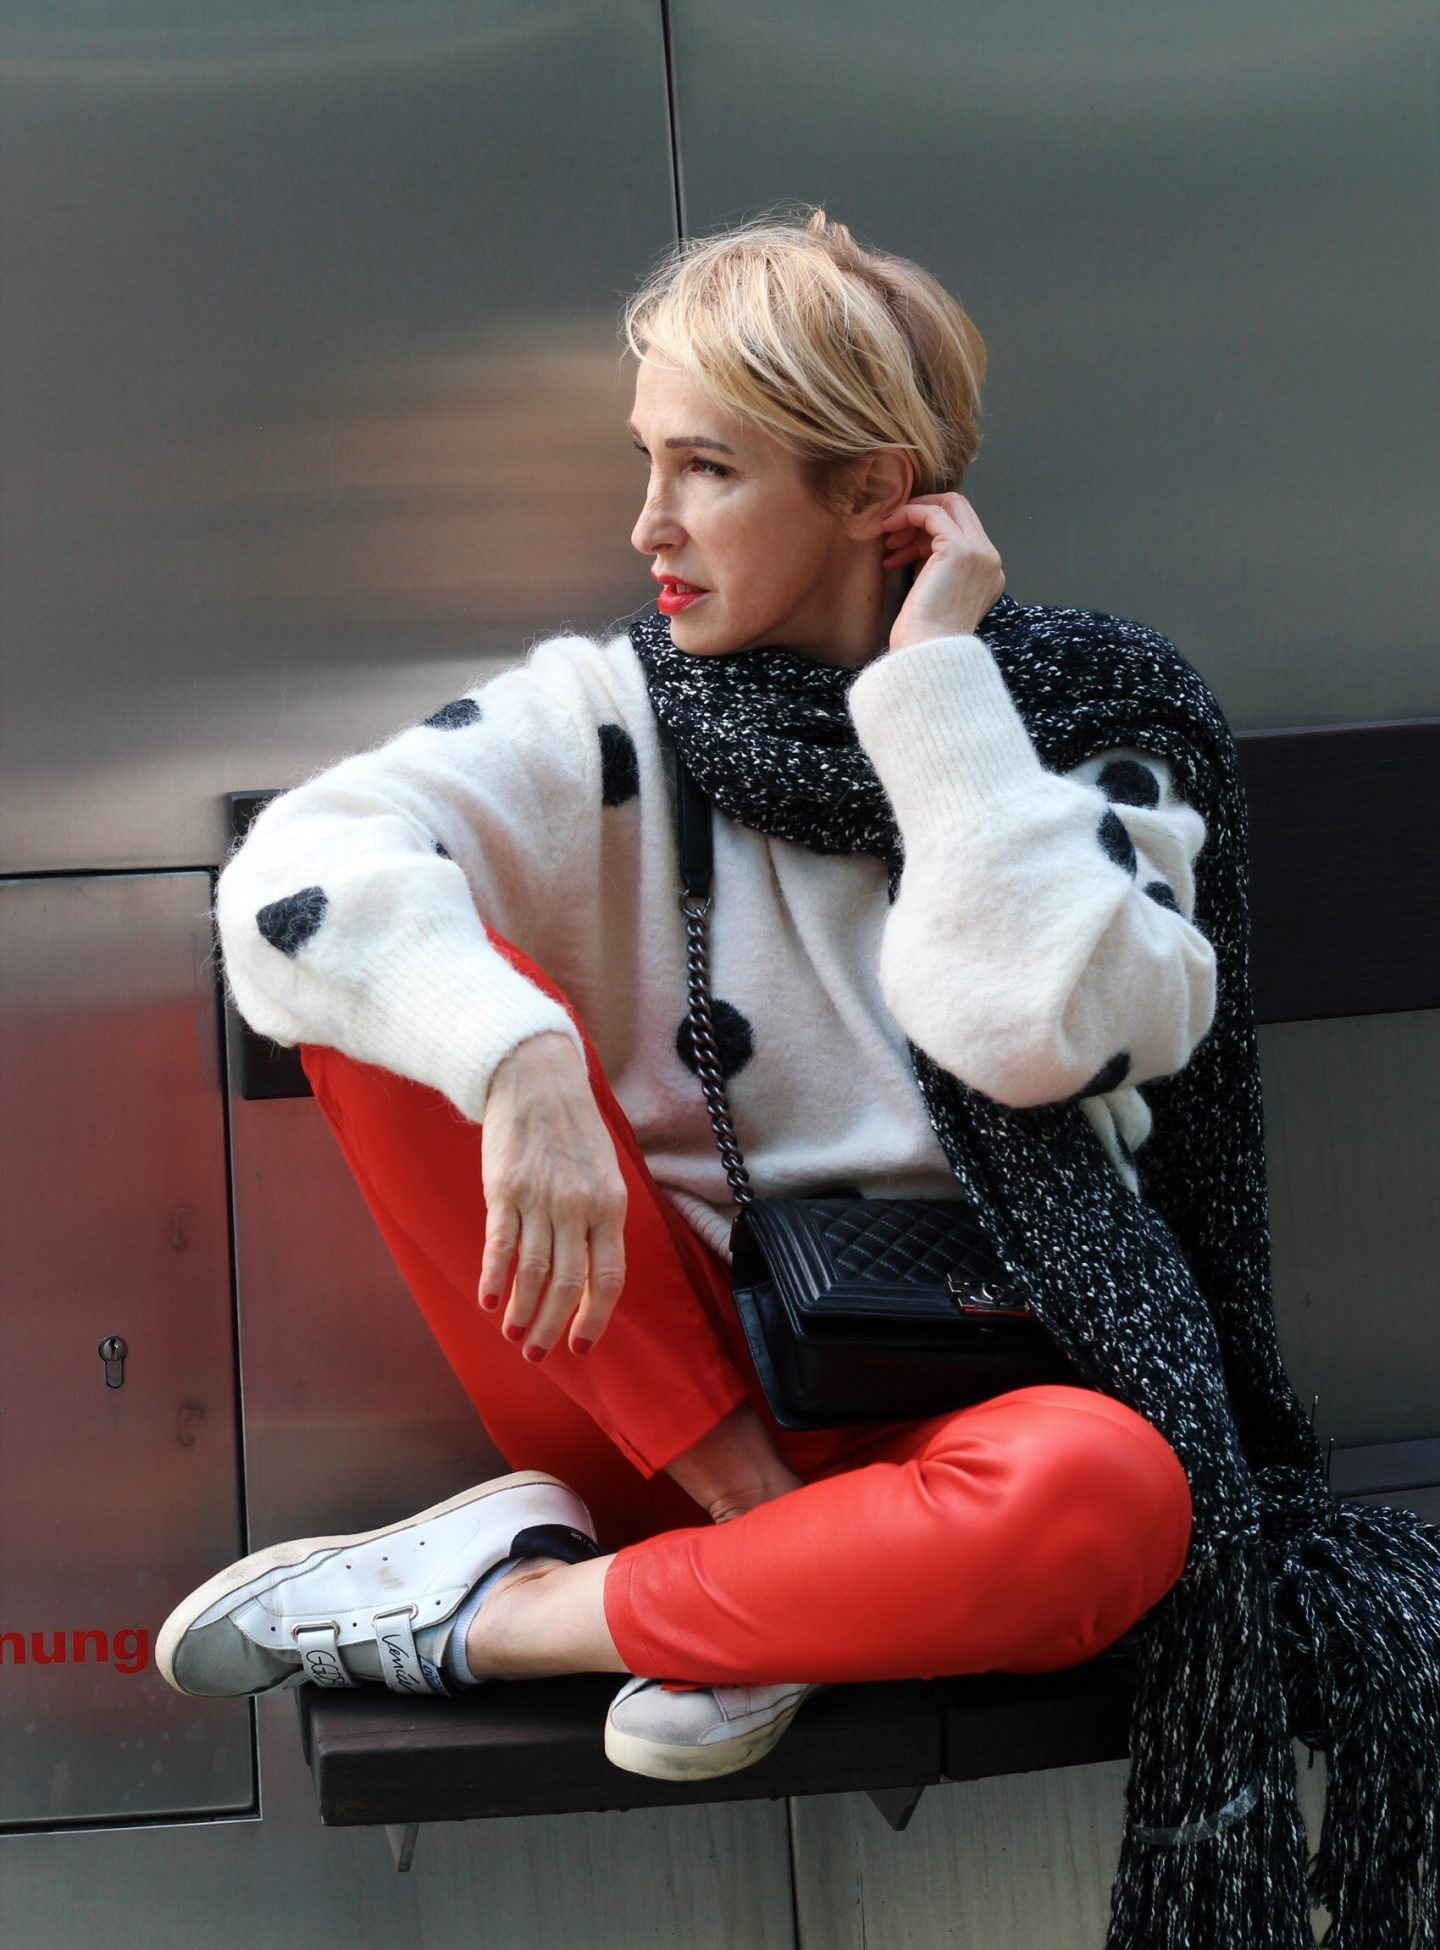 glamupyourlifestyle schal Herbst-Outfit wetterfeste-Kleidung ü-40-blog ü-50-blog ue-40-mode ue-50-blog